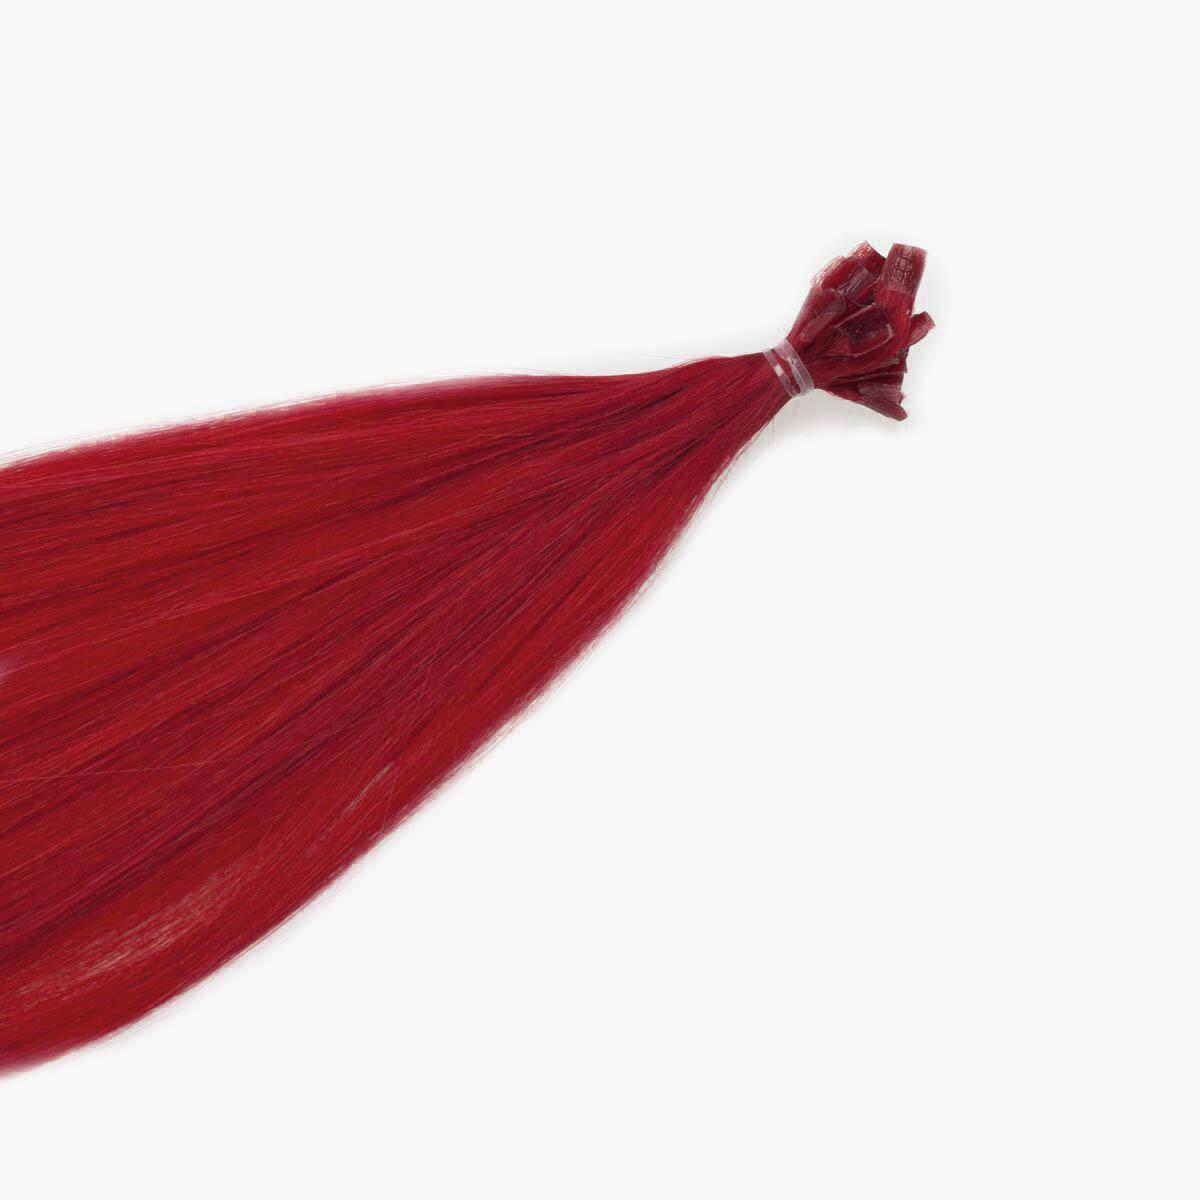 Bondings Original Glatt 6.0 Red Fire 50 cm